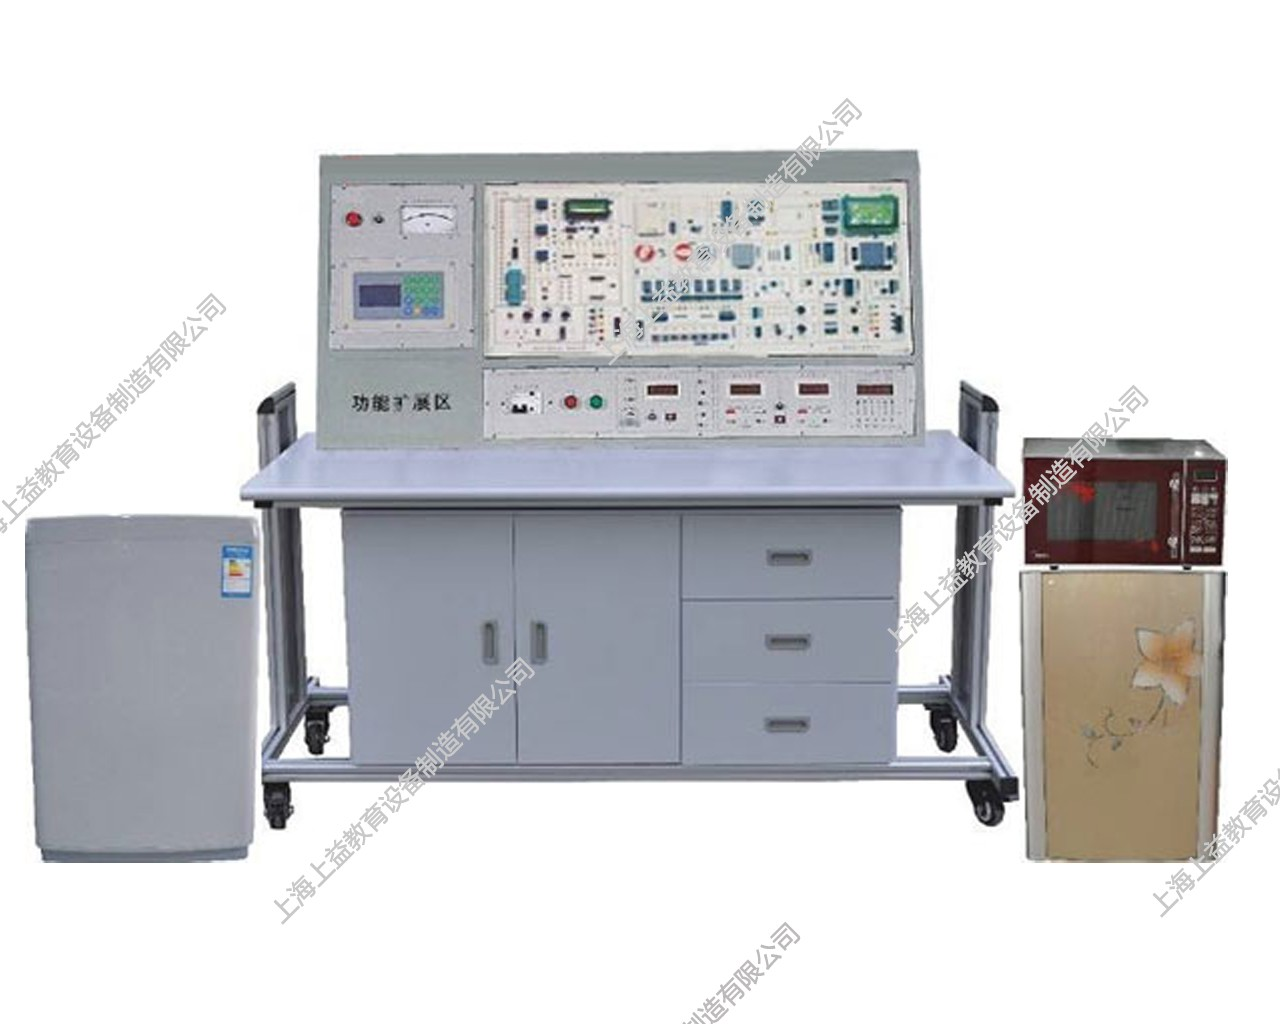 SYJYD-AII型 家用智能电子产品电器维修wwwlehu8viplehu68vip台